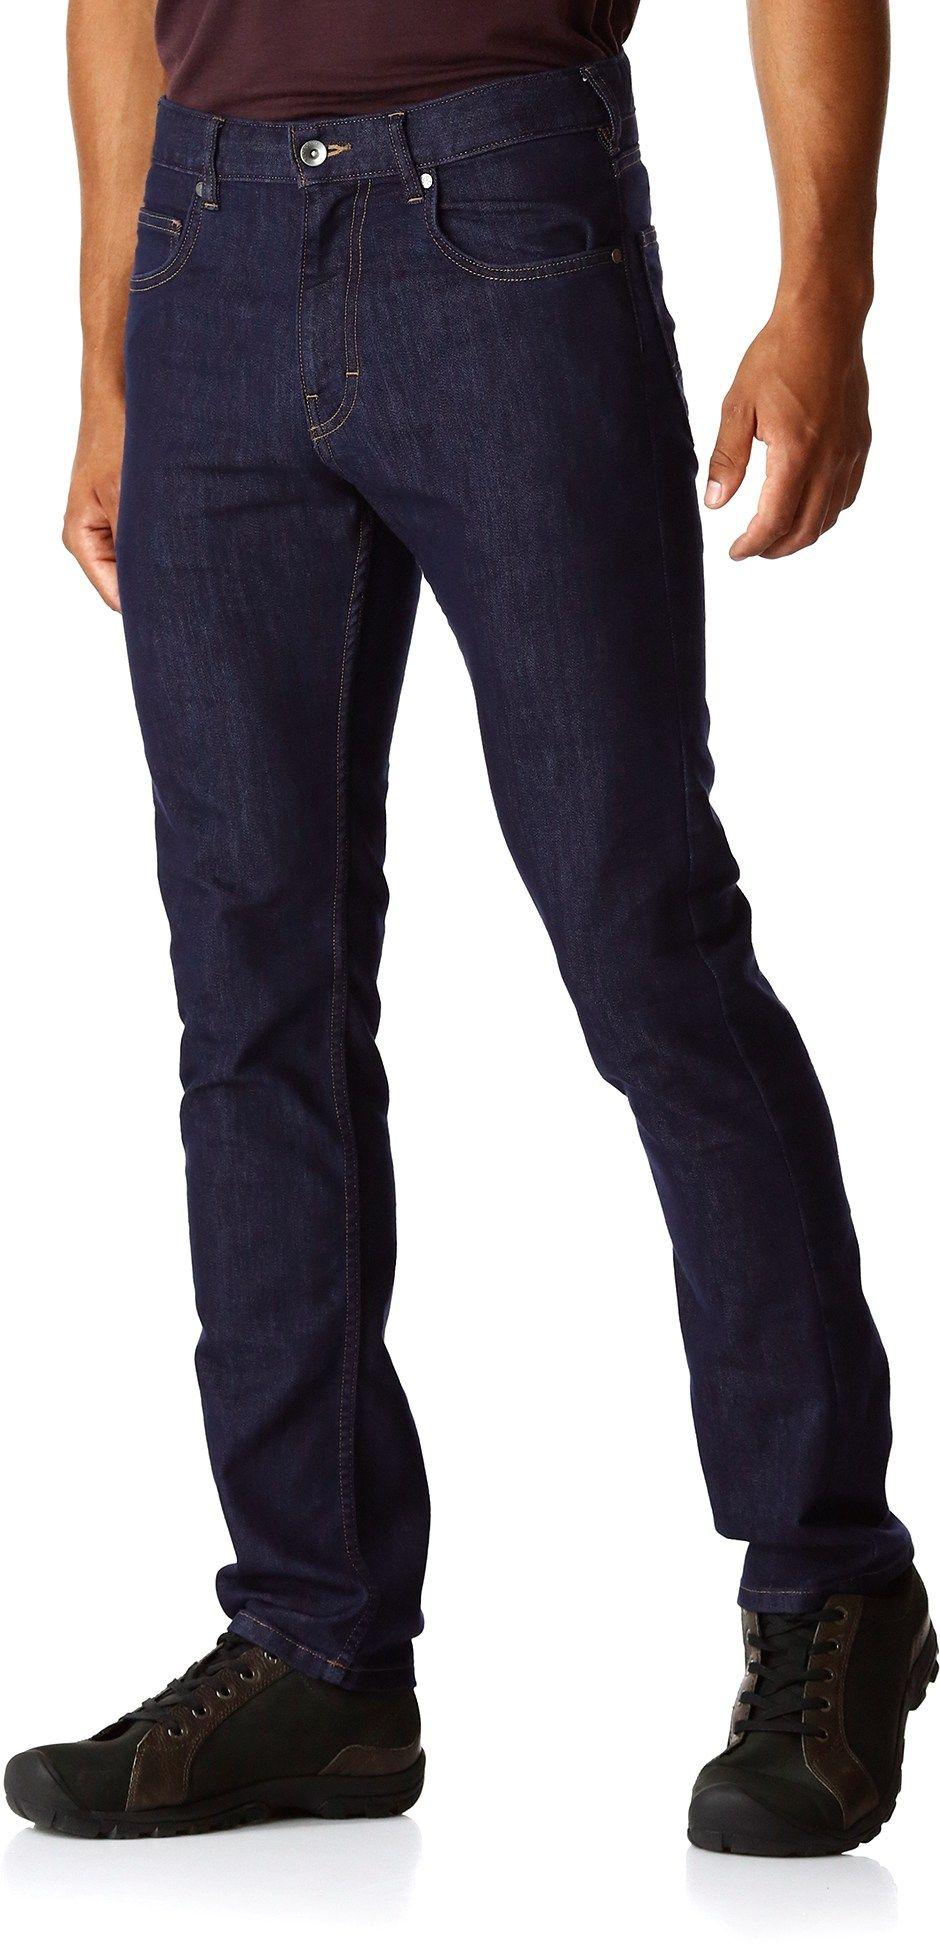 1d1f48359ddd Patagonia Men's Performance Straight Jeans 30